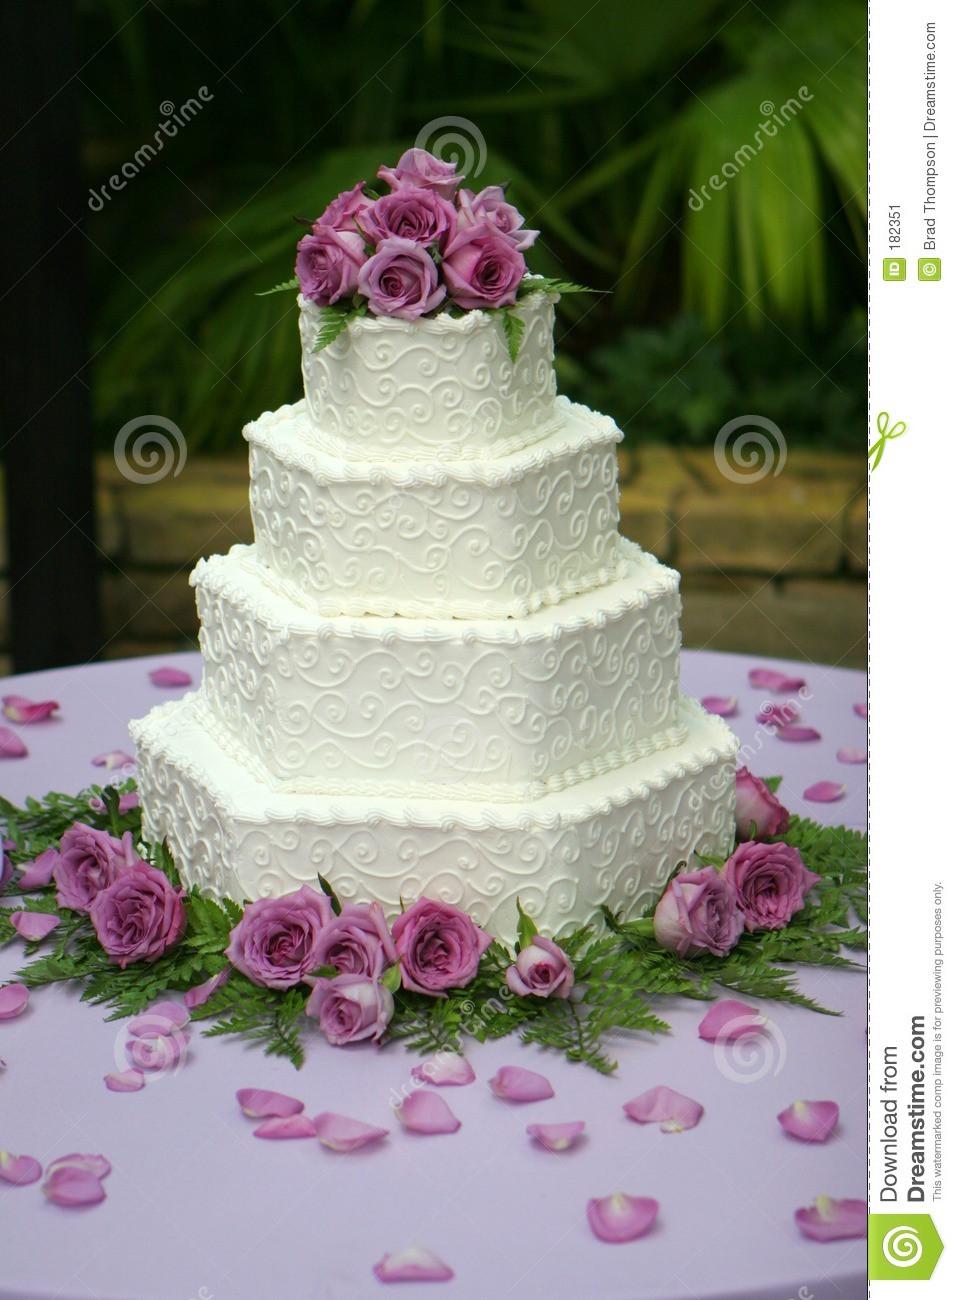 Wedding Cakes Purple Flowers  Tiered Wedding Cake With Purple Flowers Stock Image